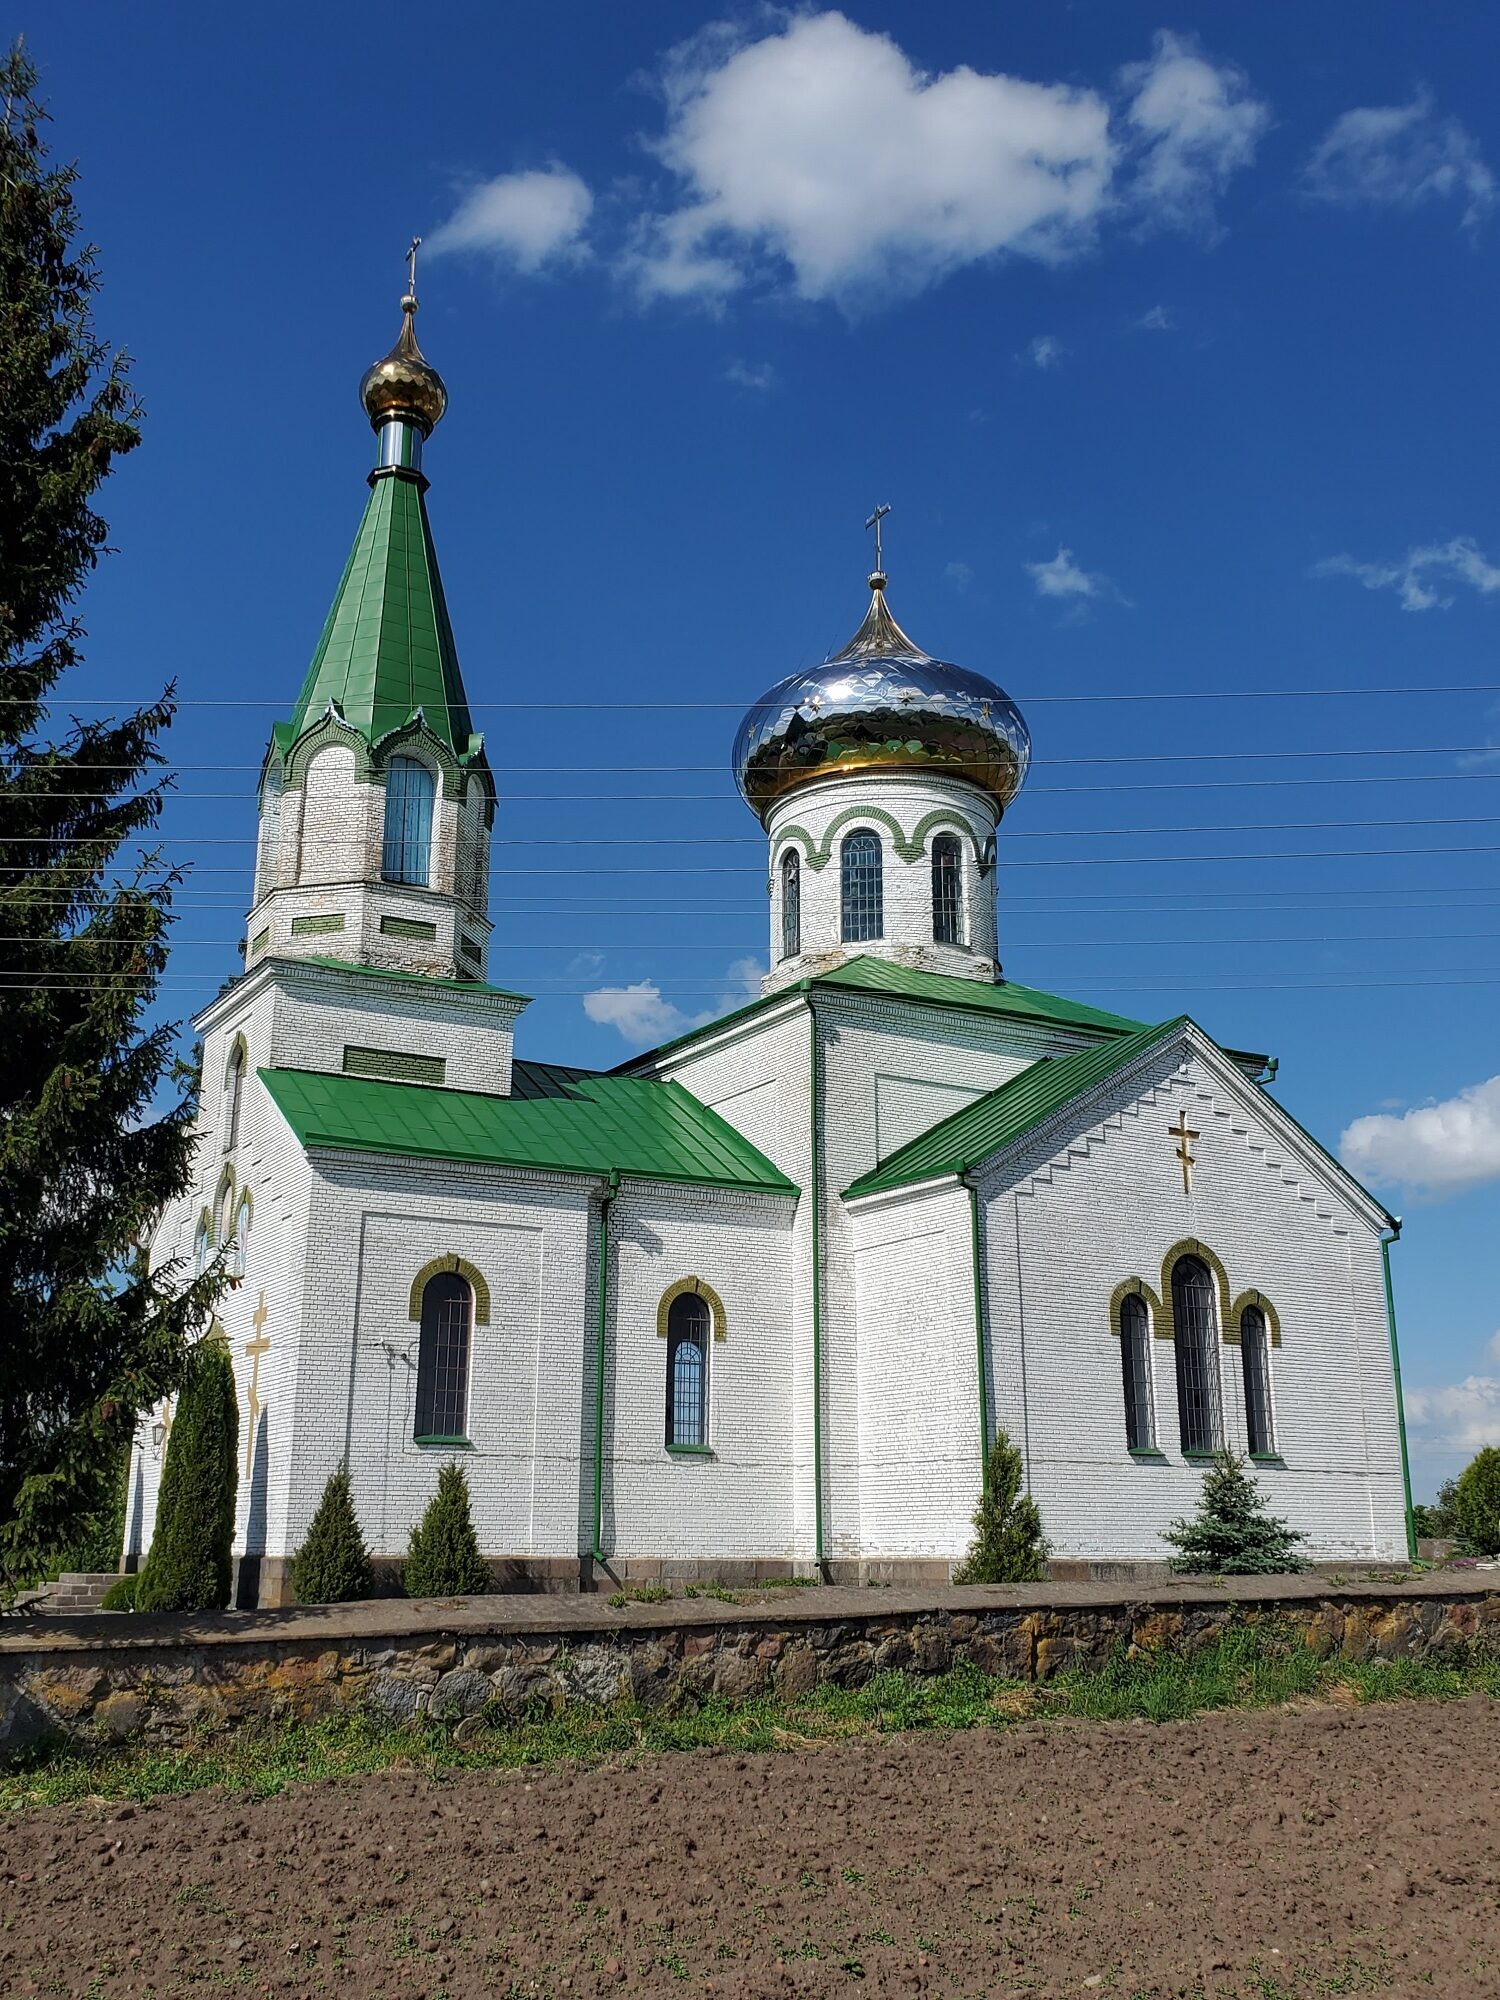 20200606 163546 rotated - Церковь Святого Георгия Победоносца в Ситцах